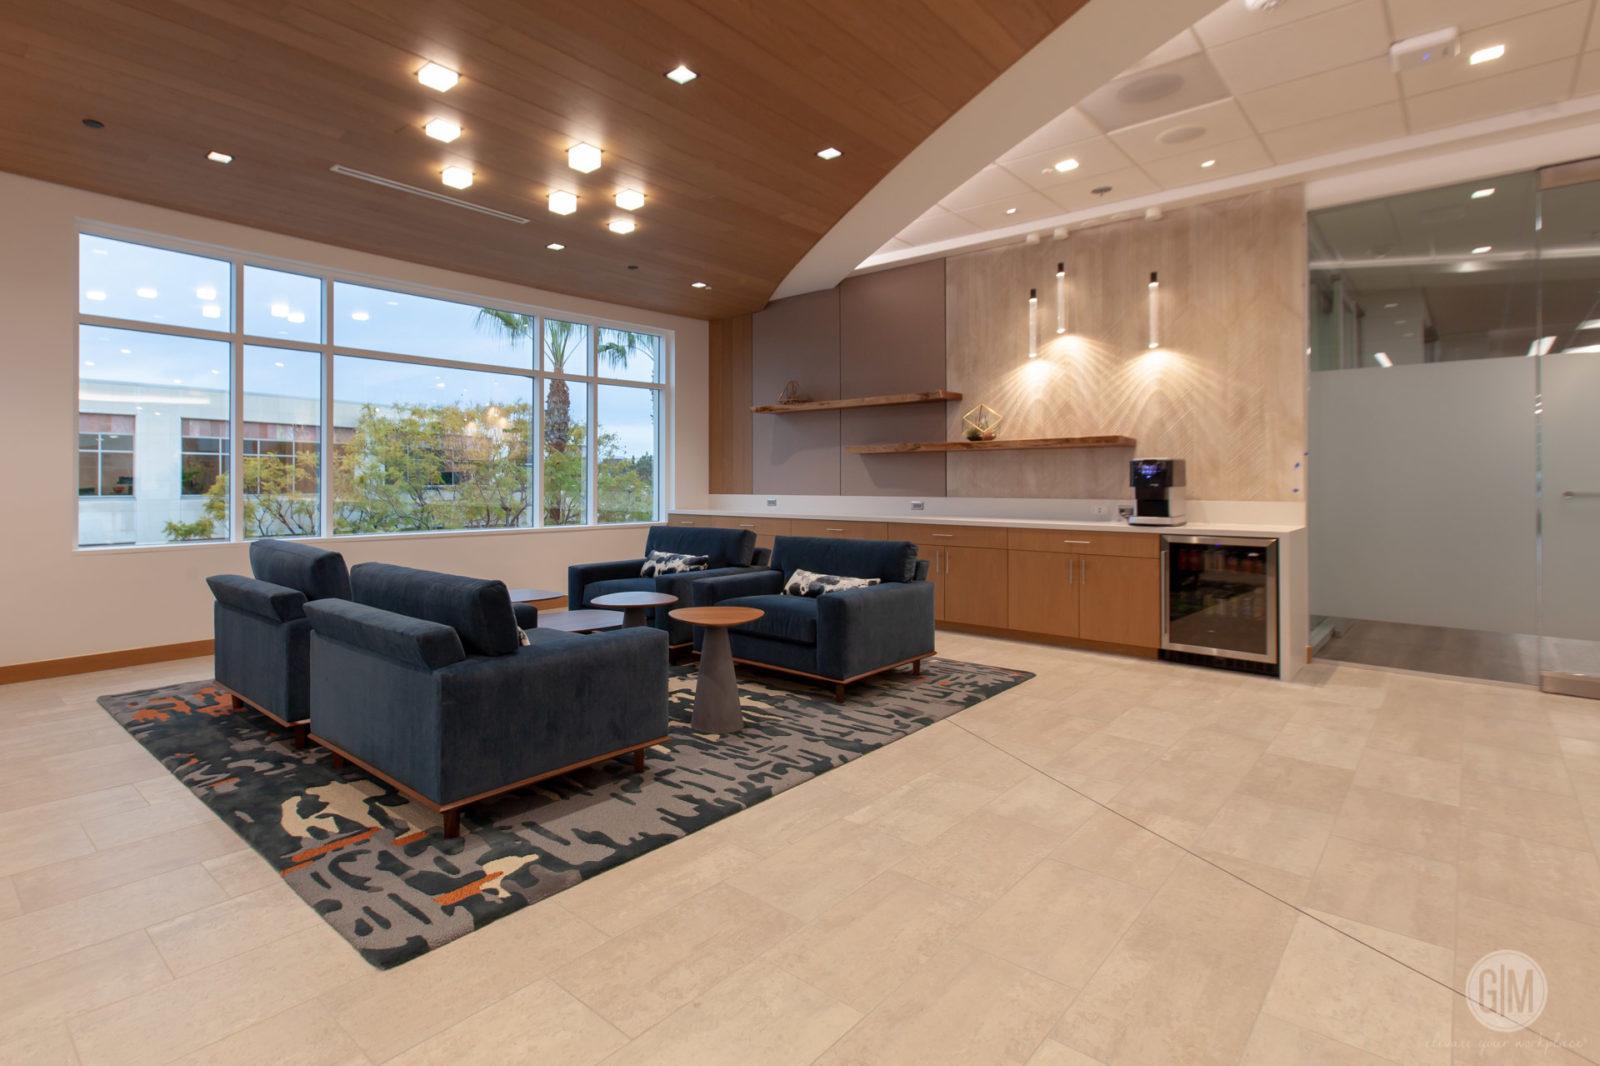 Perkins Coie San Diego Waiting Area